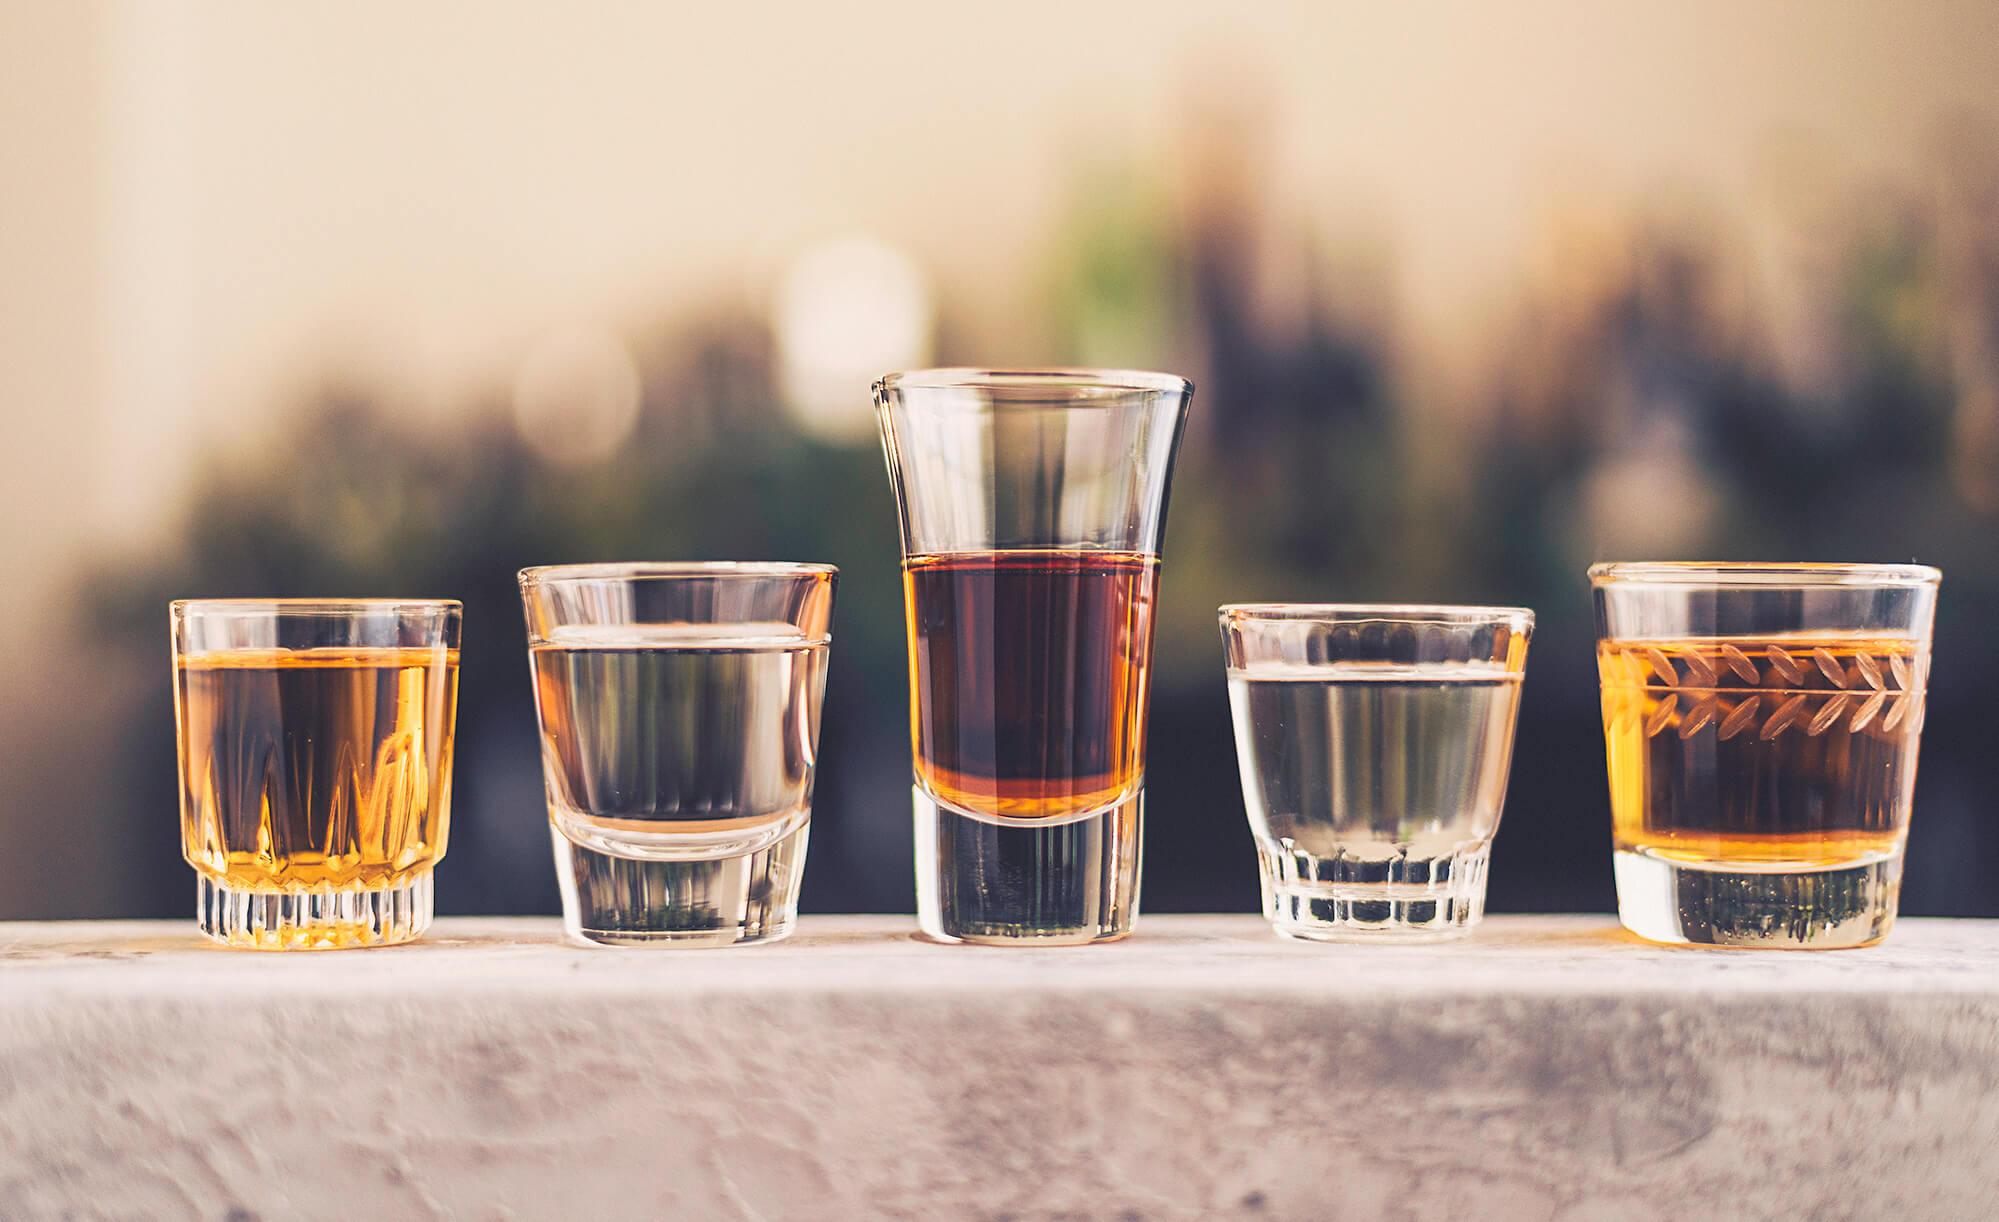 dtc liquor shipping